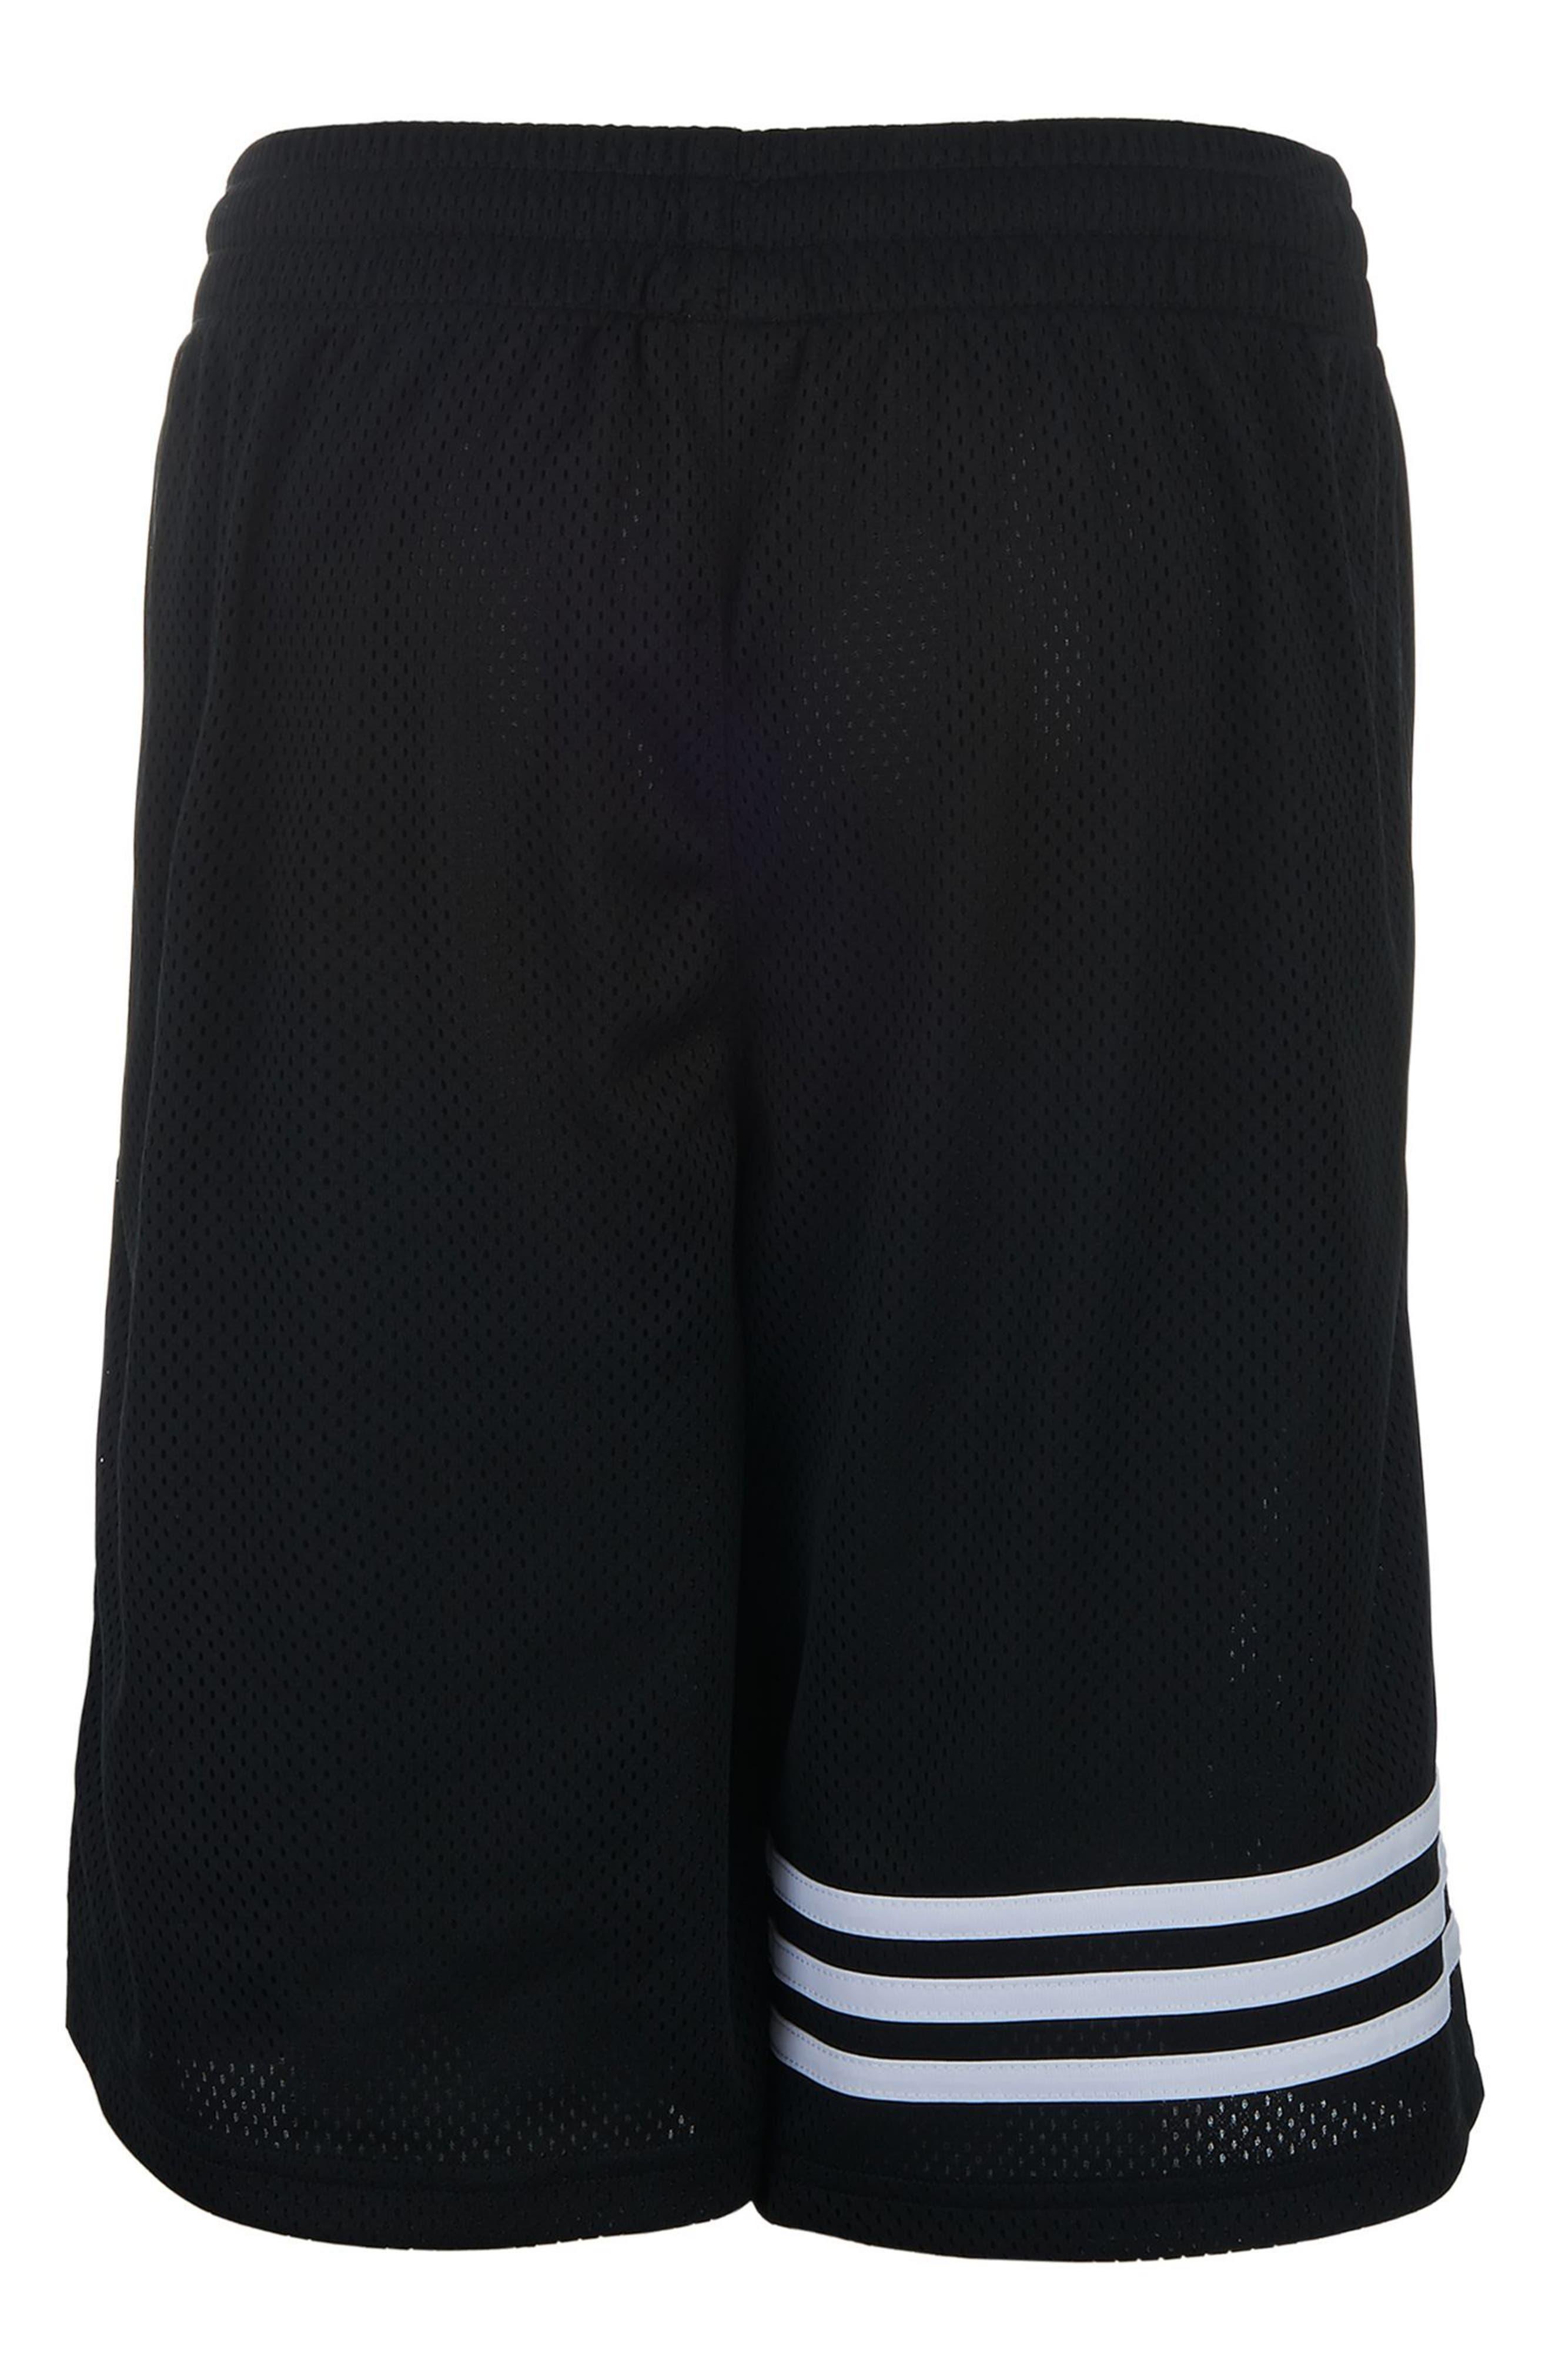 Replenishment Defender Shorts,                             Alternate thumbnail 4, color,